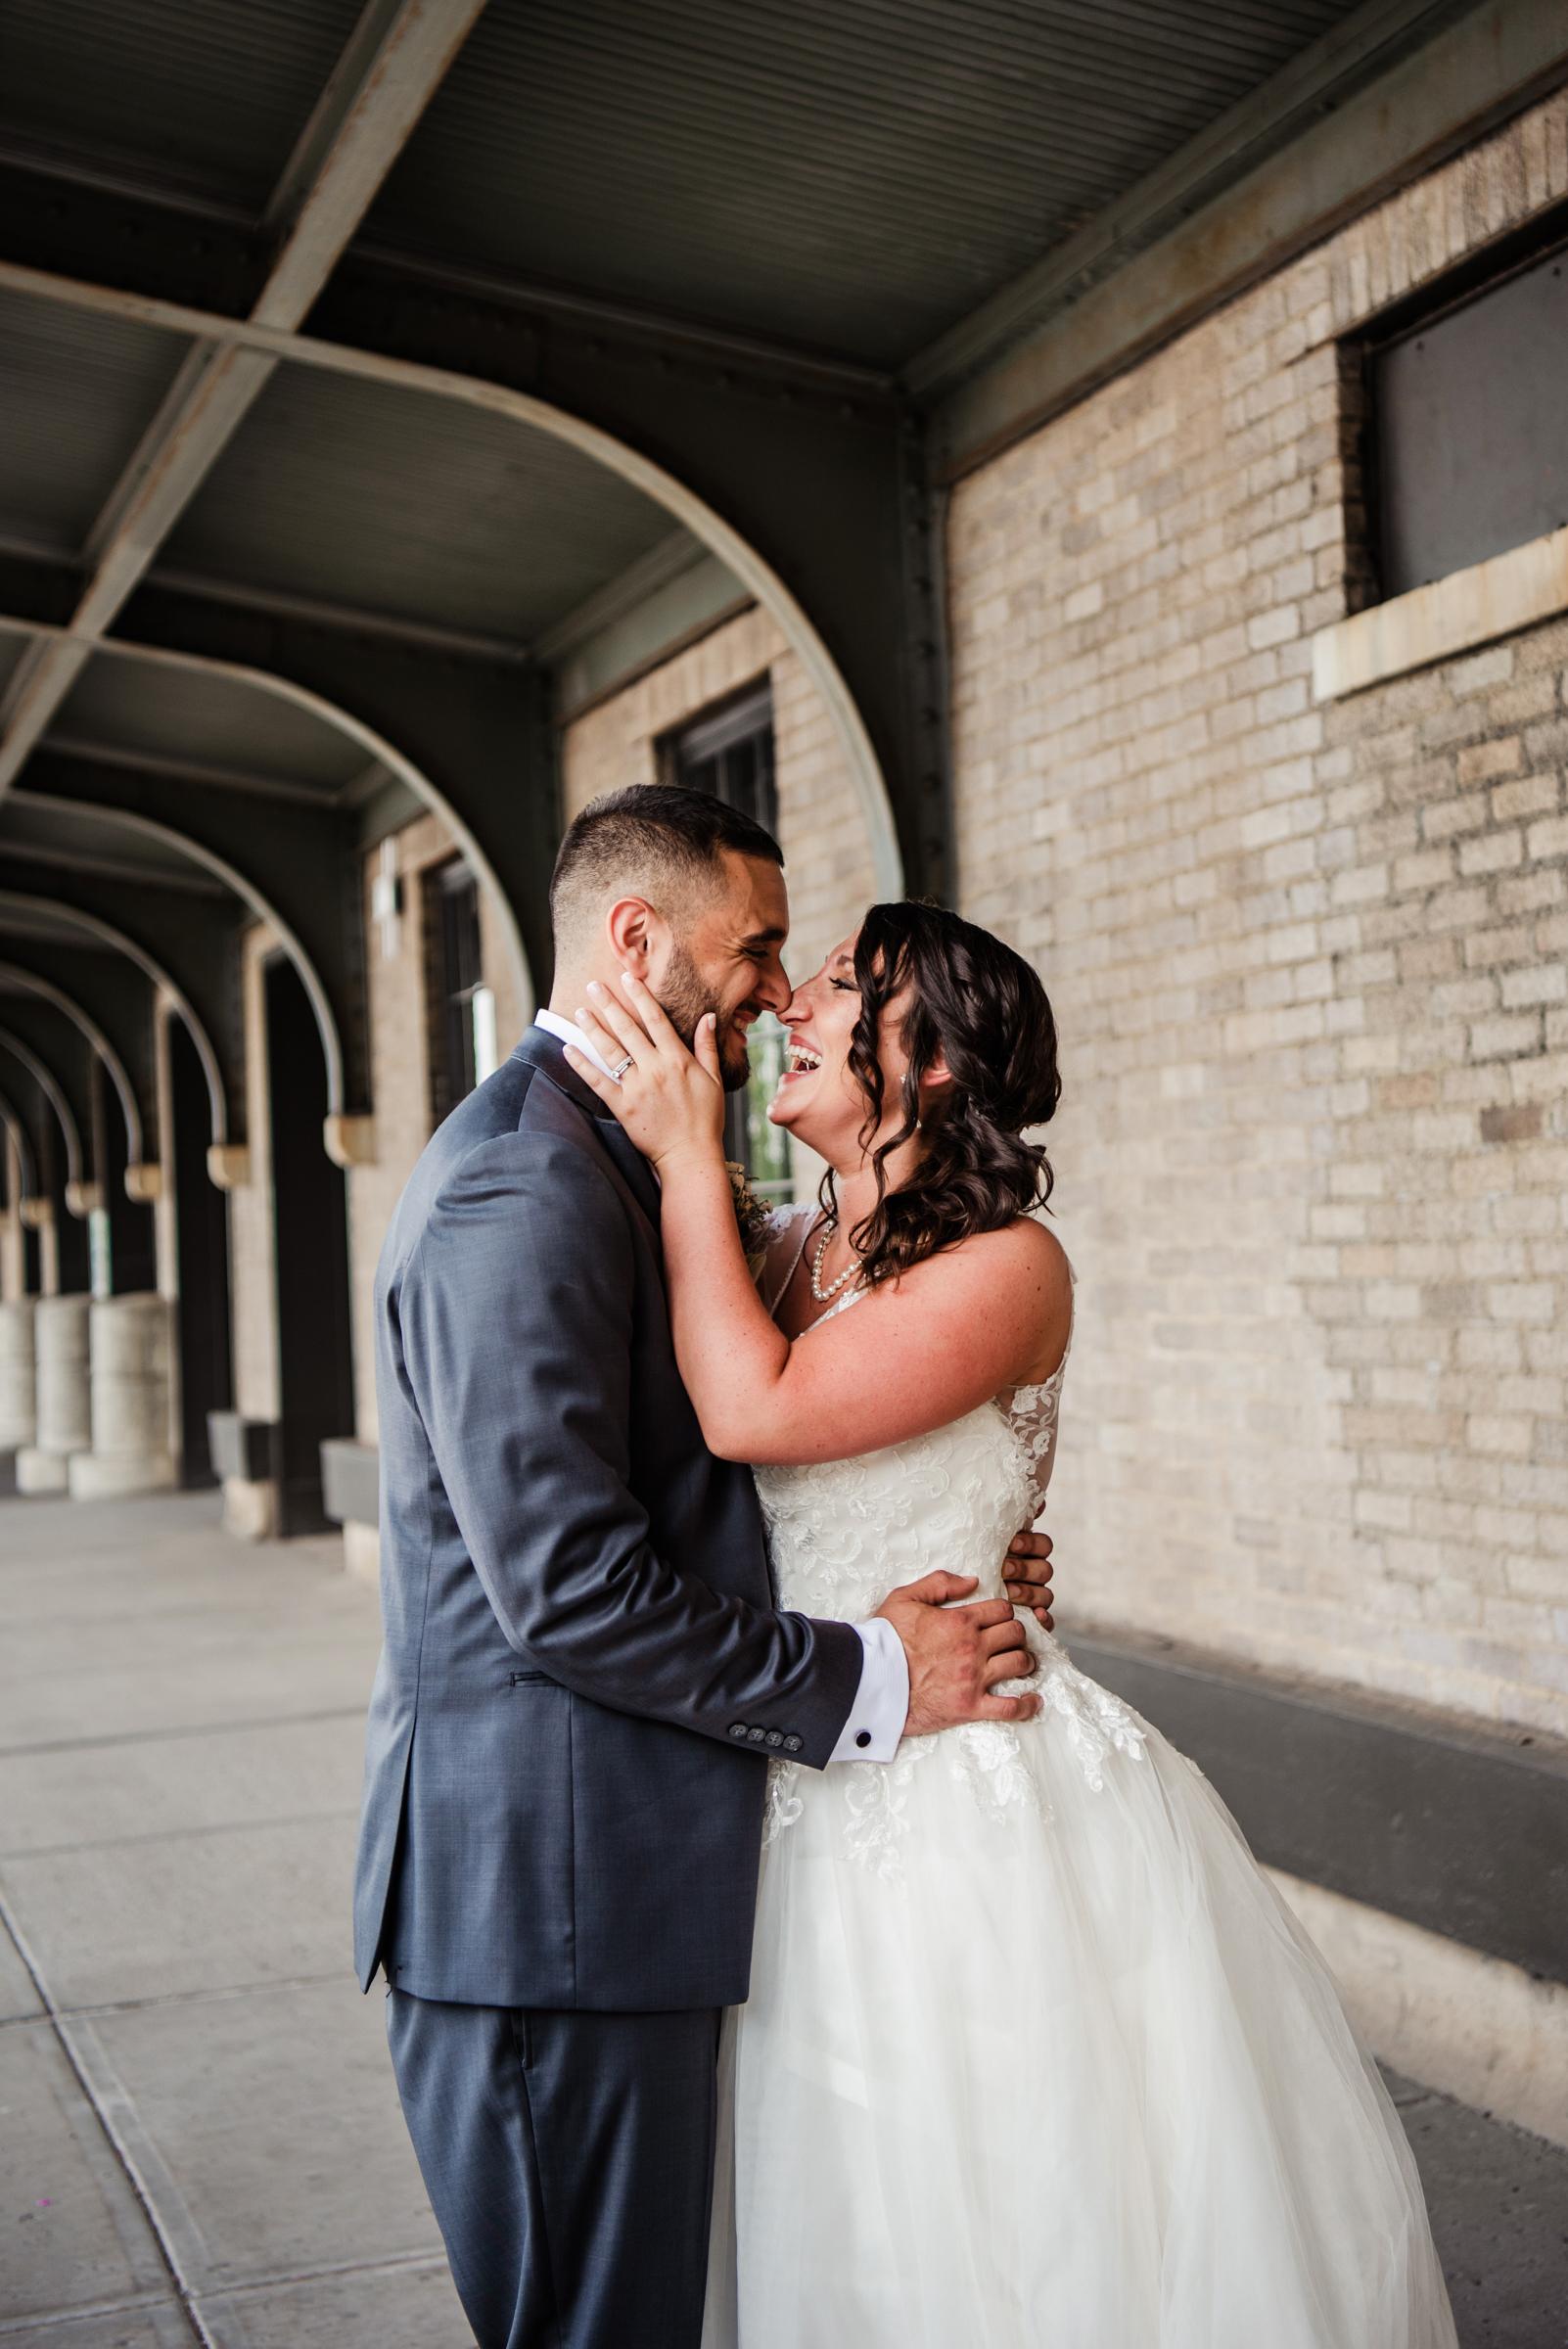 Historic_Old_St_Johns_Church_Valentinos_Banquet_Hall_Central_NY_Wedding_JILL_STUDIO_Rochester_NY_Photographer_DSC_6349.jpg